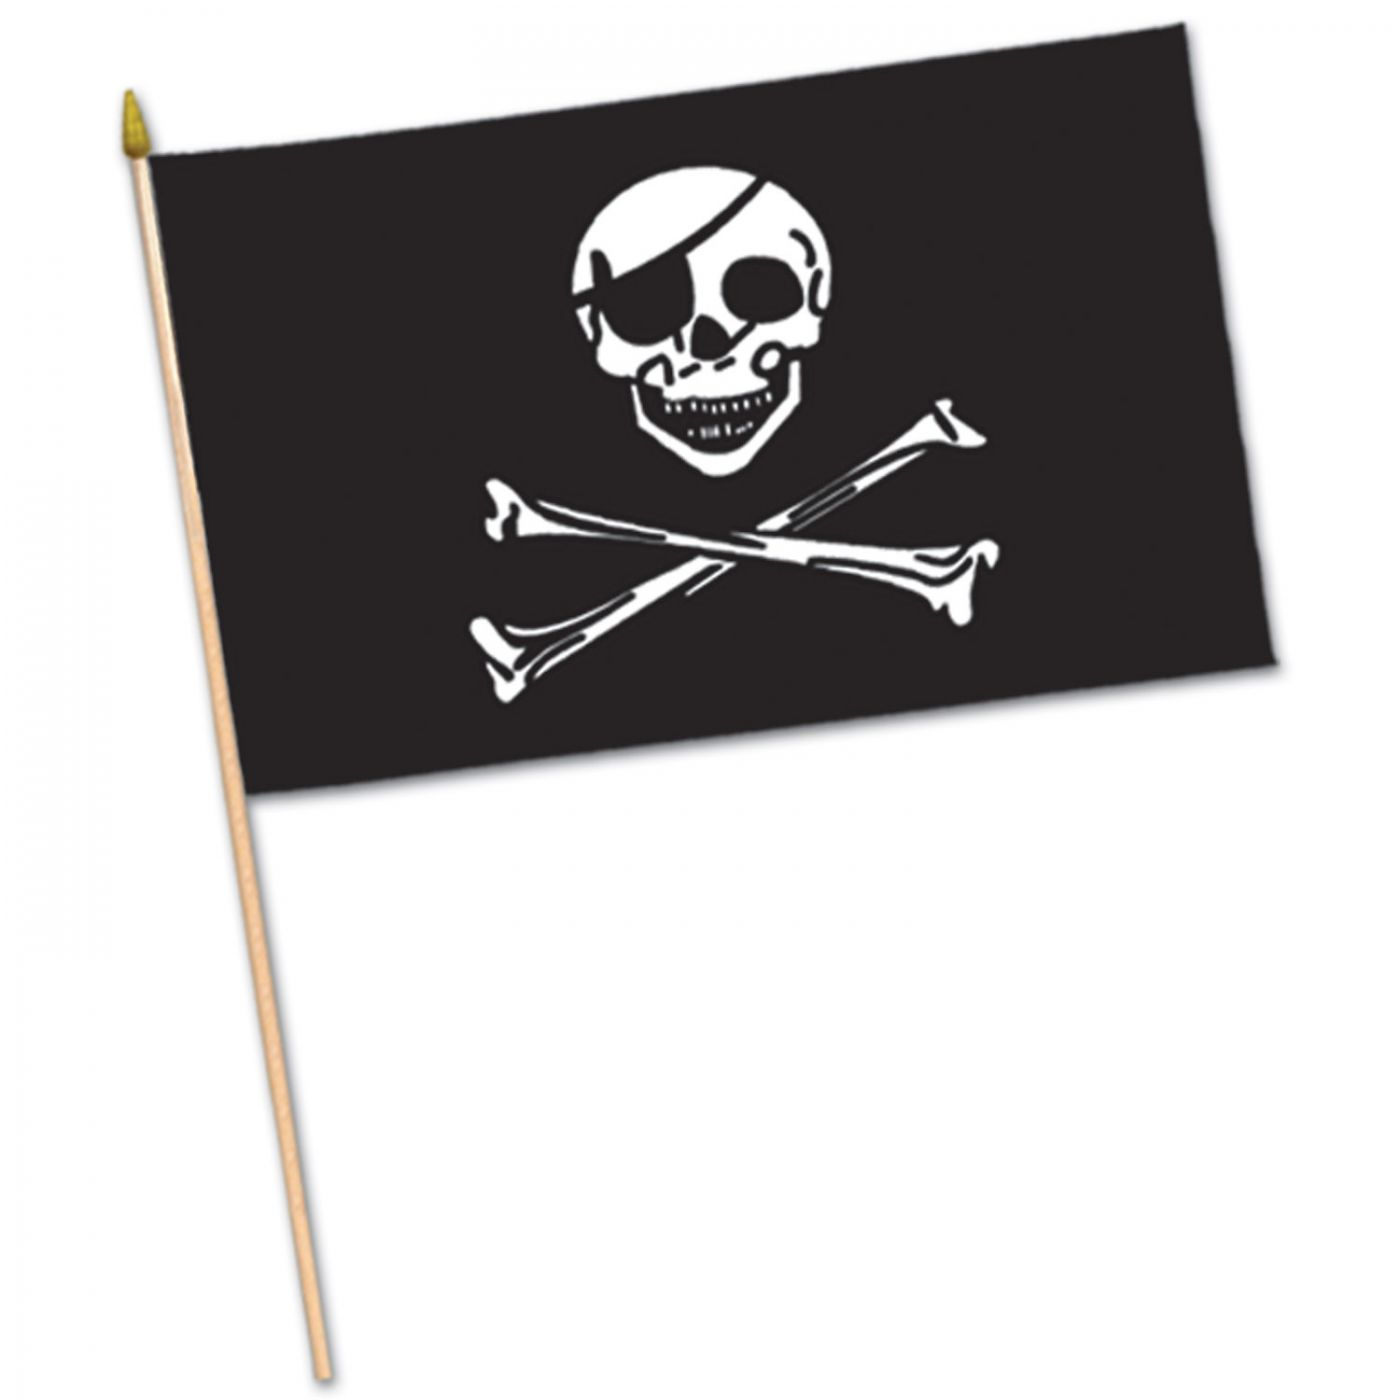 Pirate Flag - Fabric image